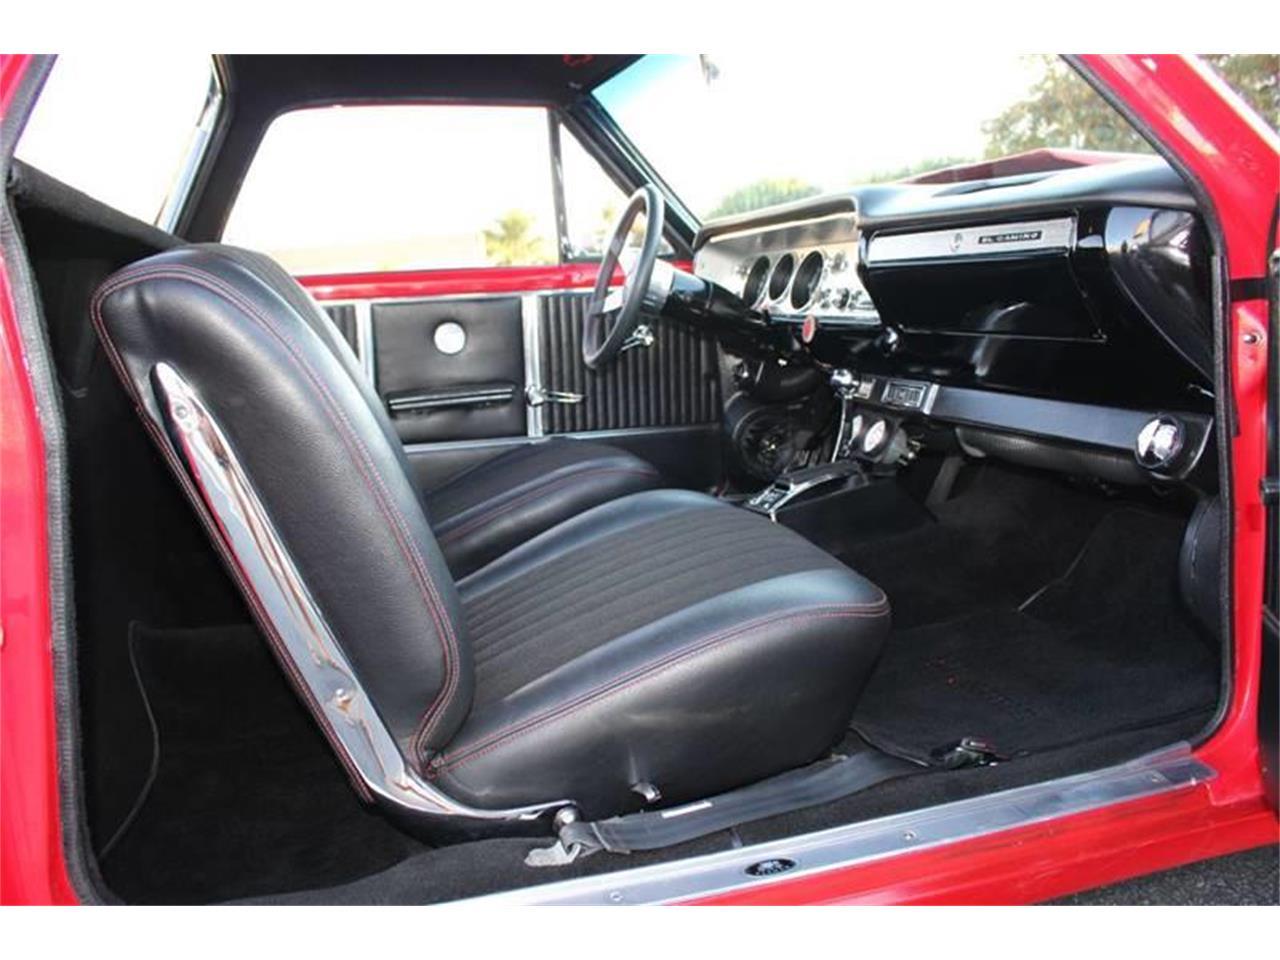 Large Picture of 1964 Chevrolet El Camino located in La Verne California - MH9D